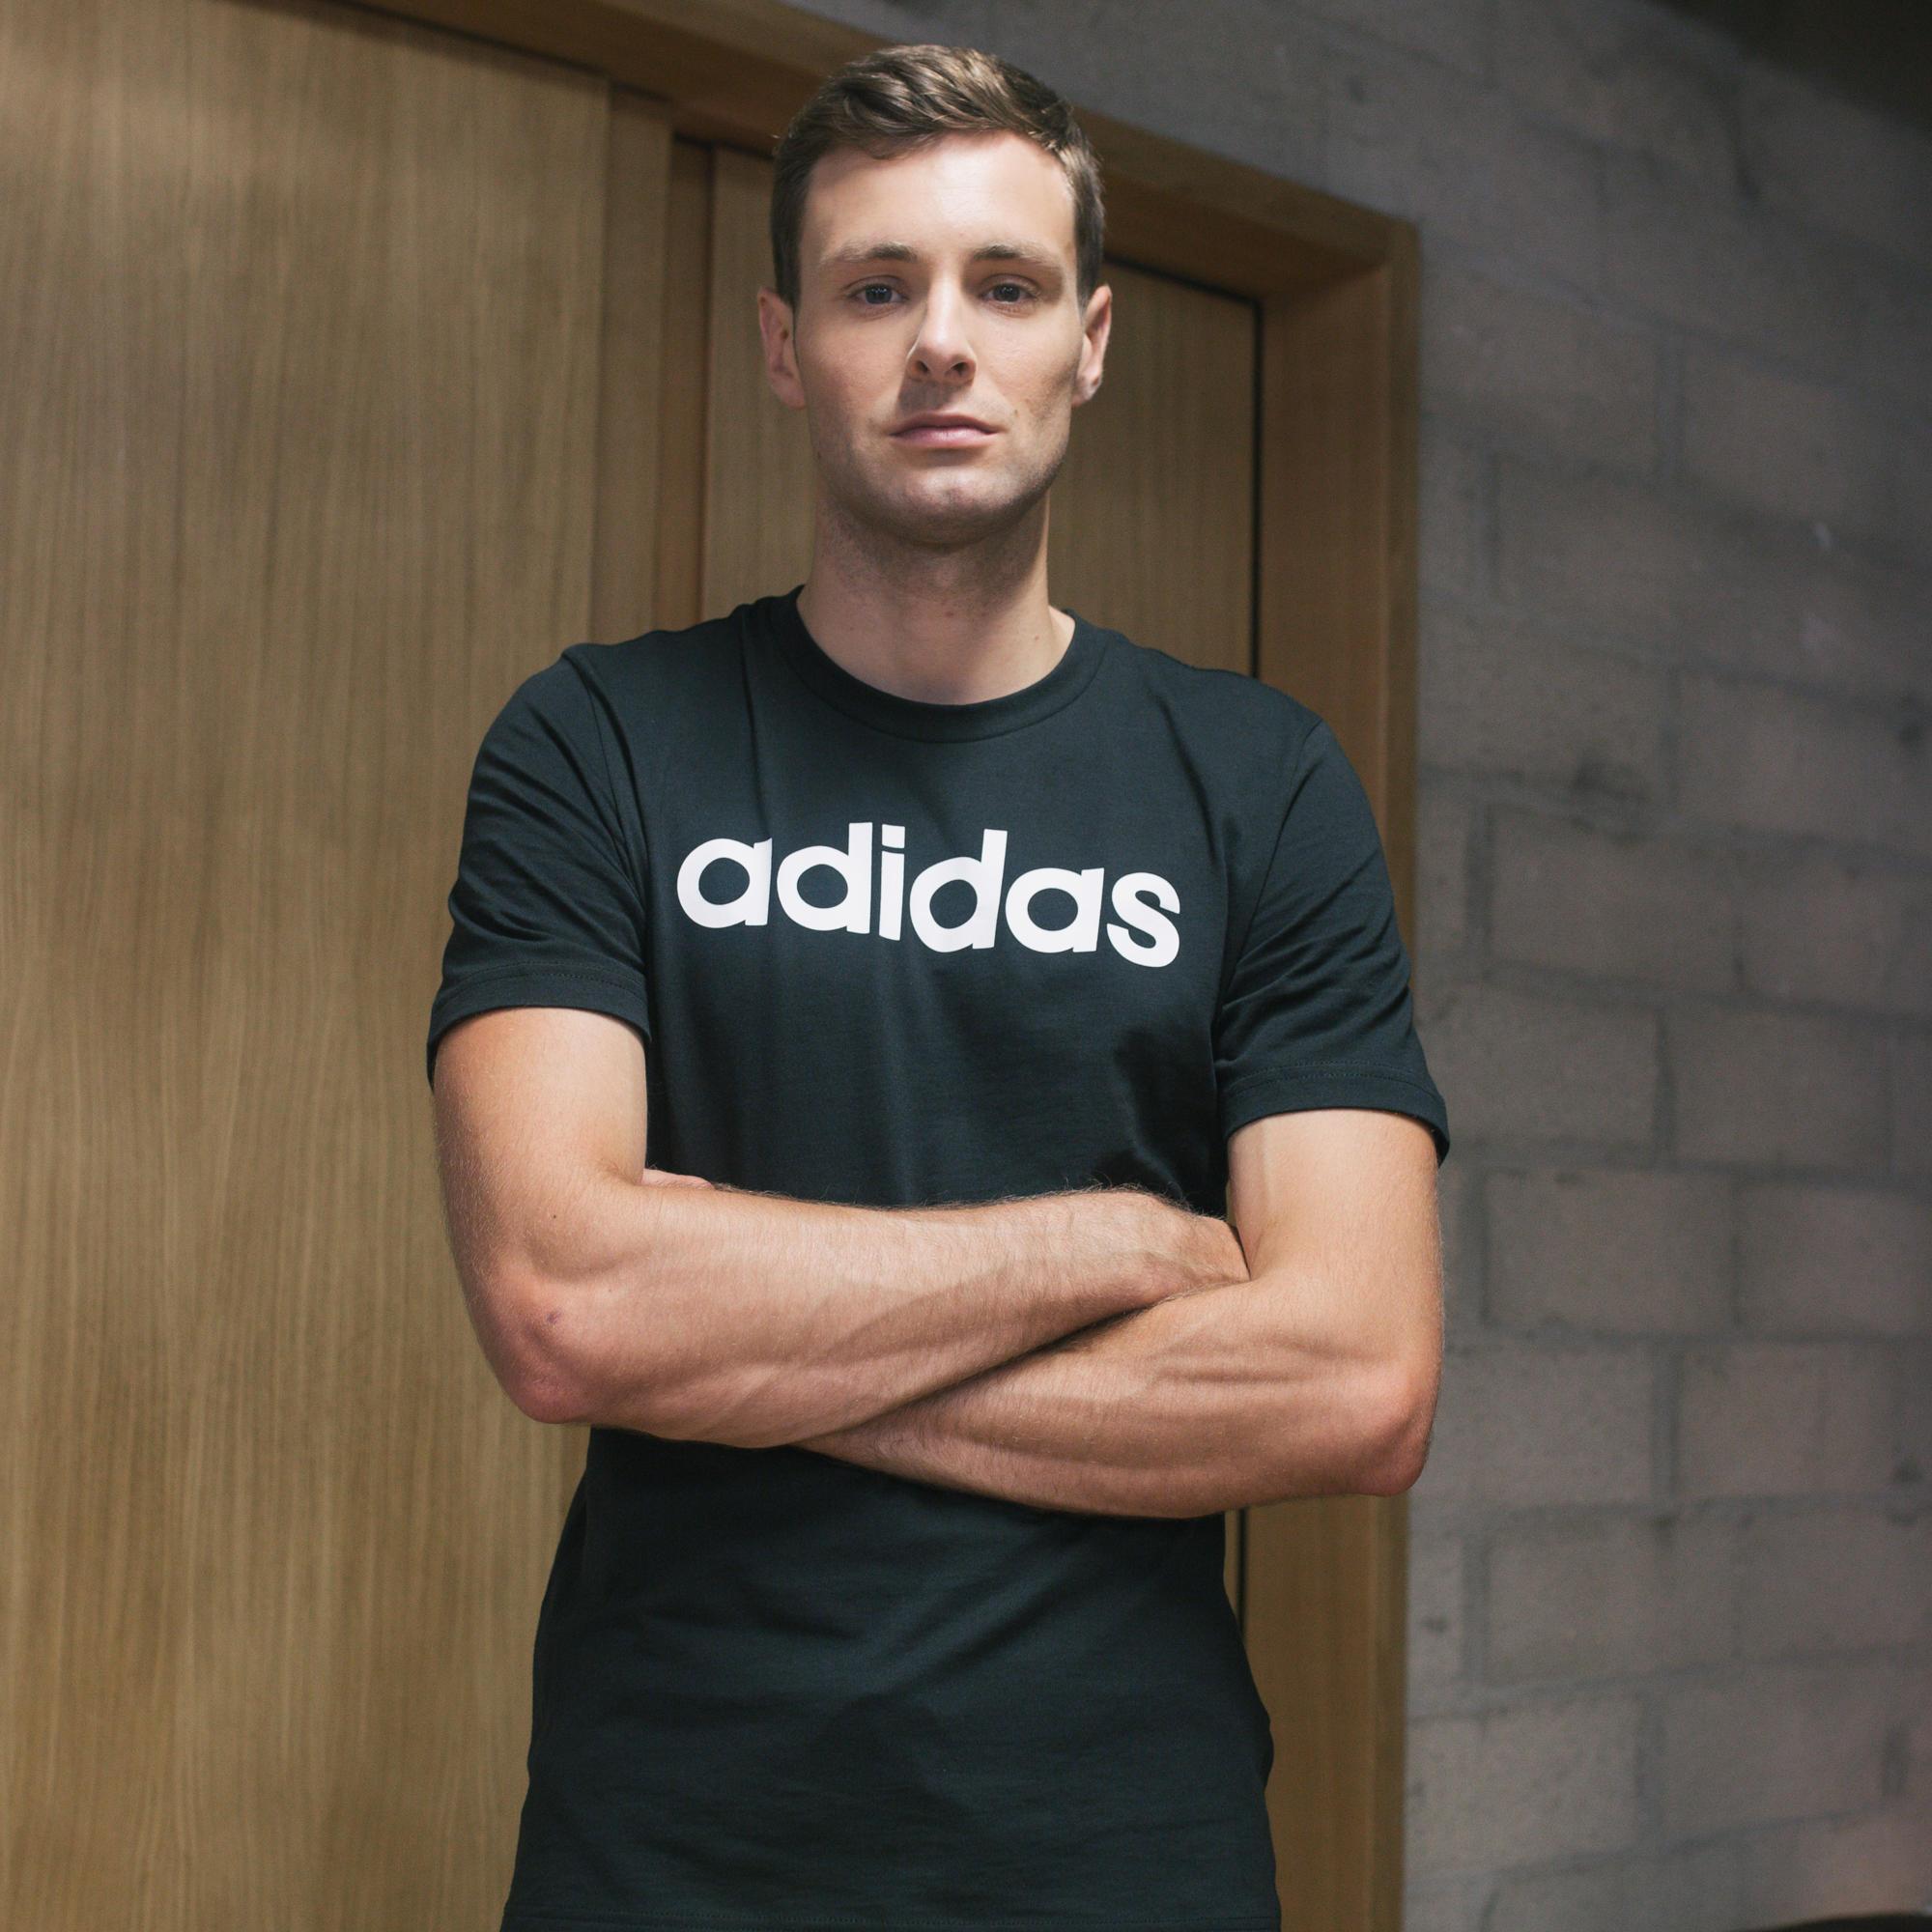 Dato Alrededores Seducir  Camiseta manga corta Adidas hombre negro estampado ADIDAS | Decathlon